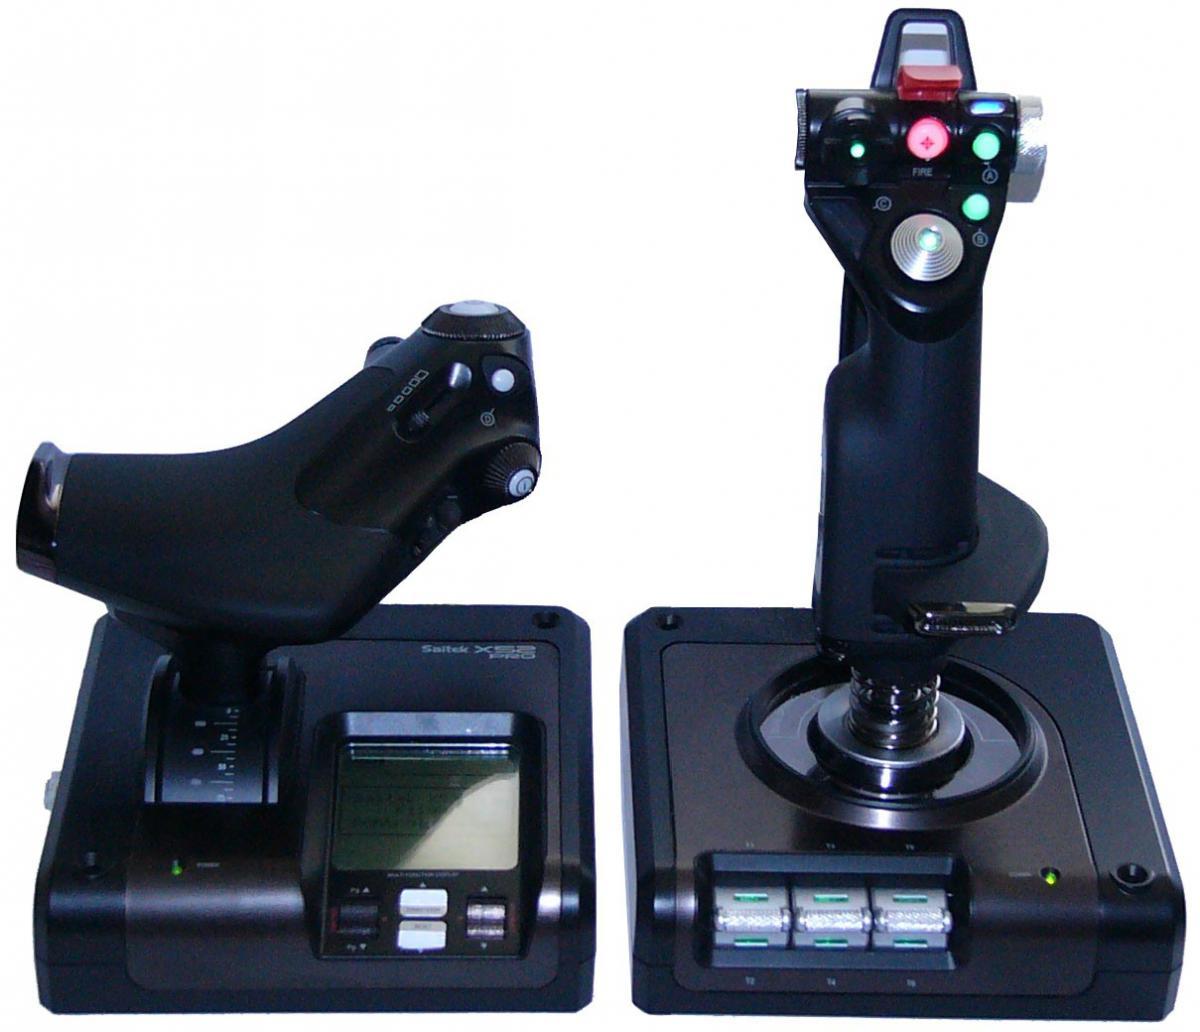 Nombre:  saitek-x52-pro-stick-and-throttle.jpg Visitas: 499 Tamaño: 94.7 KB